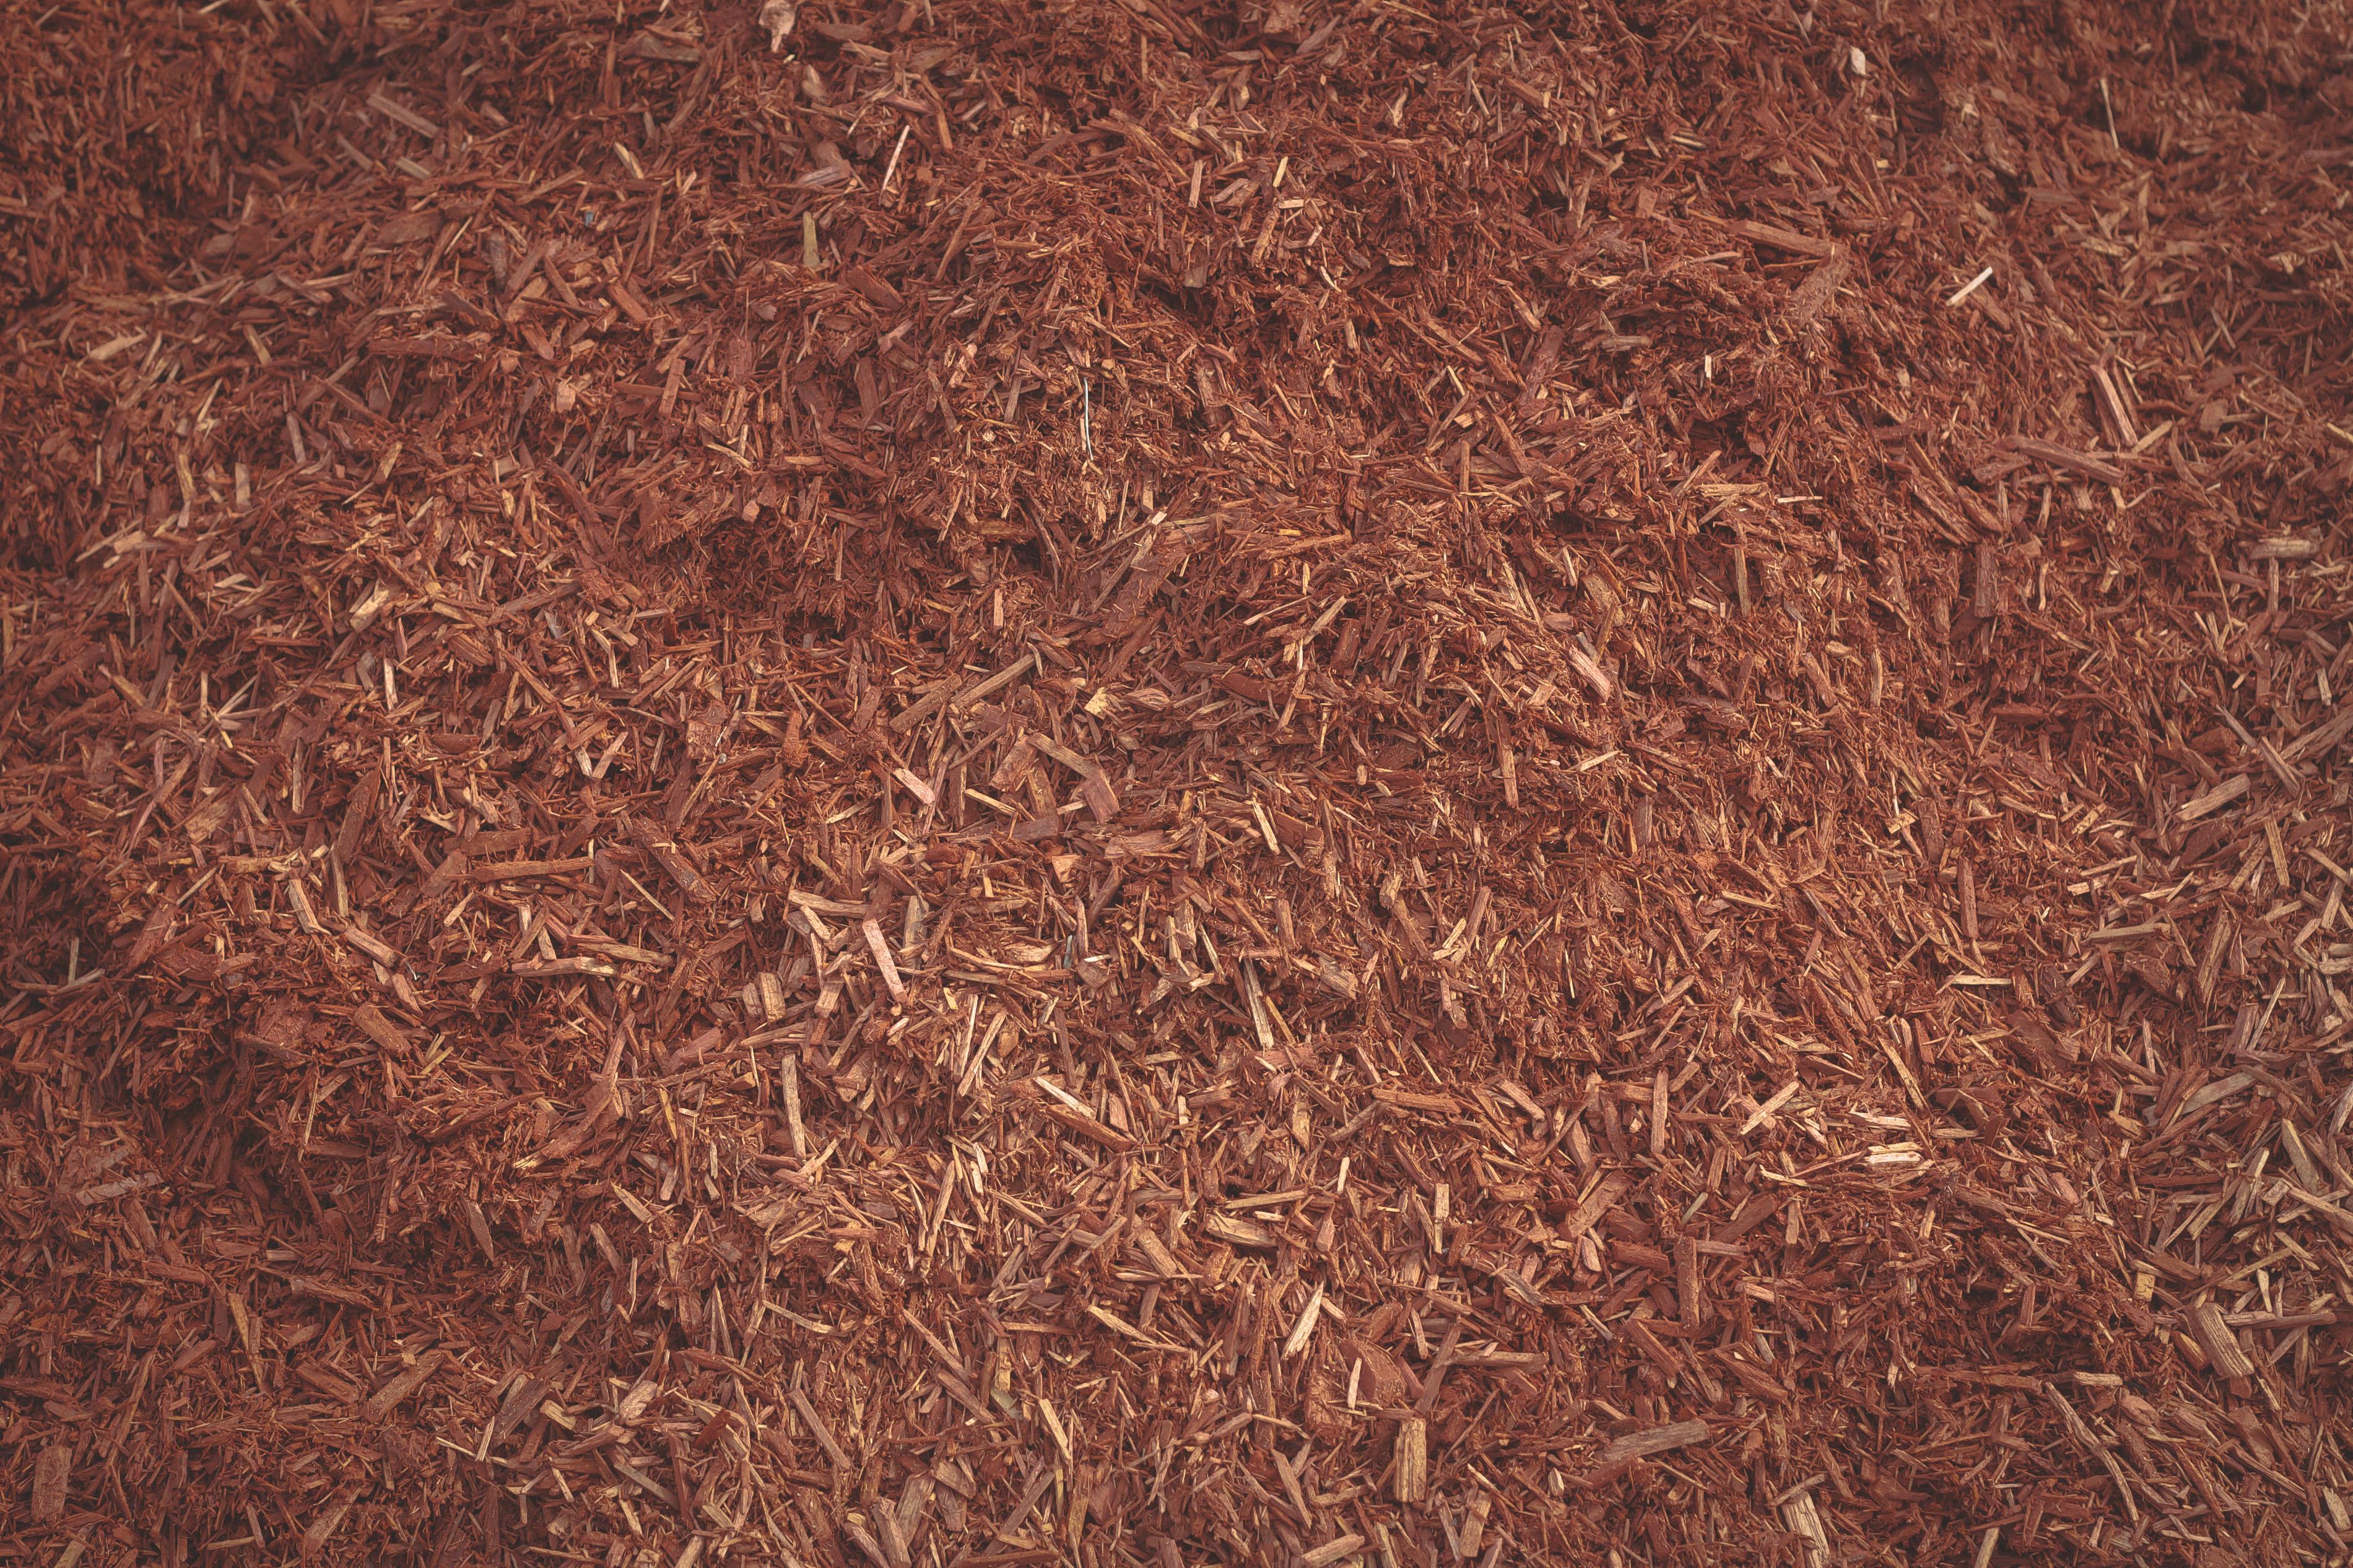 Mulch closeup Landscape Supply Photography